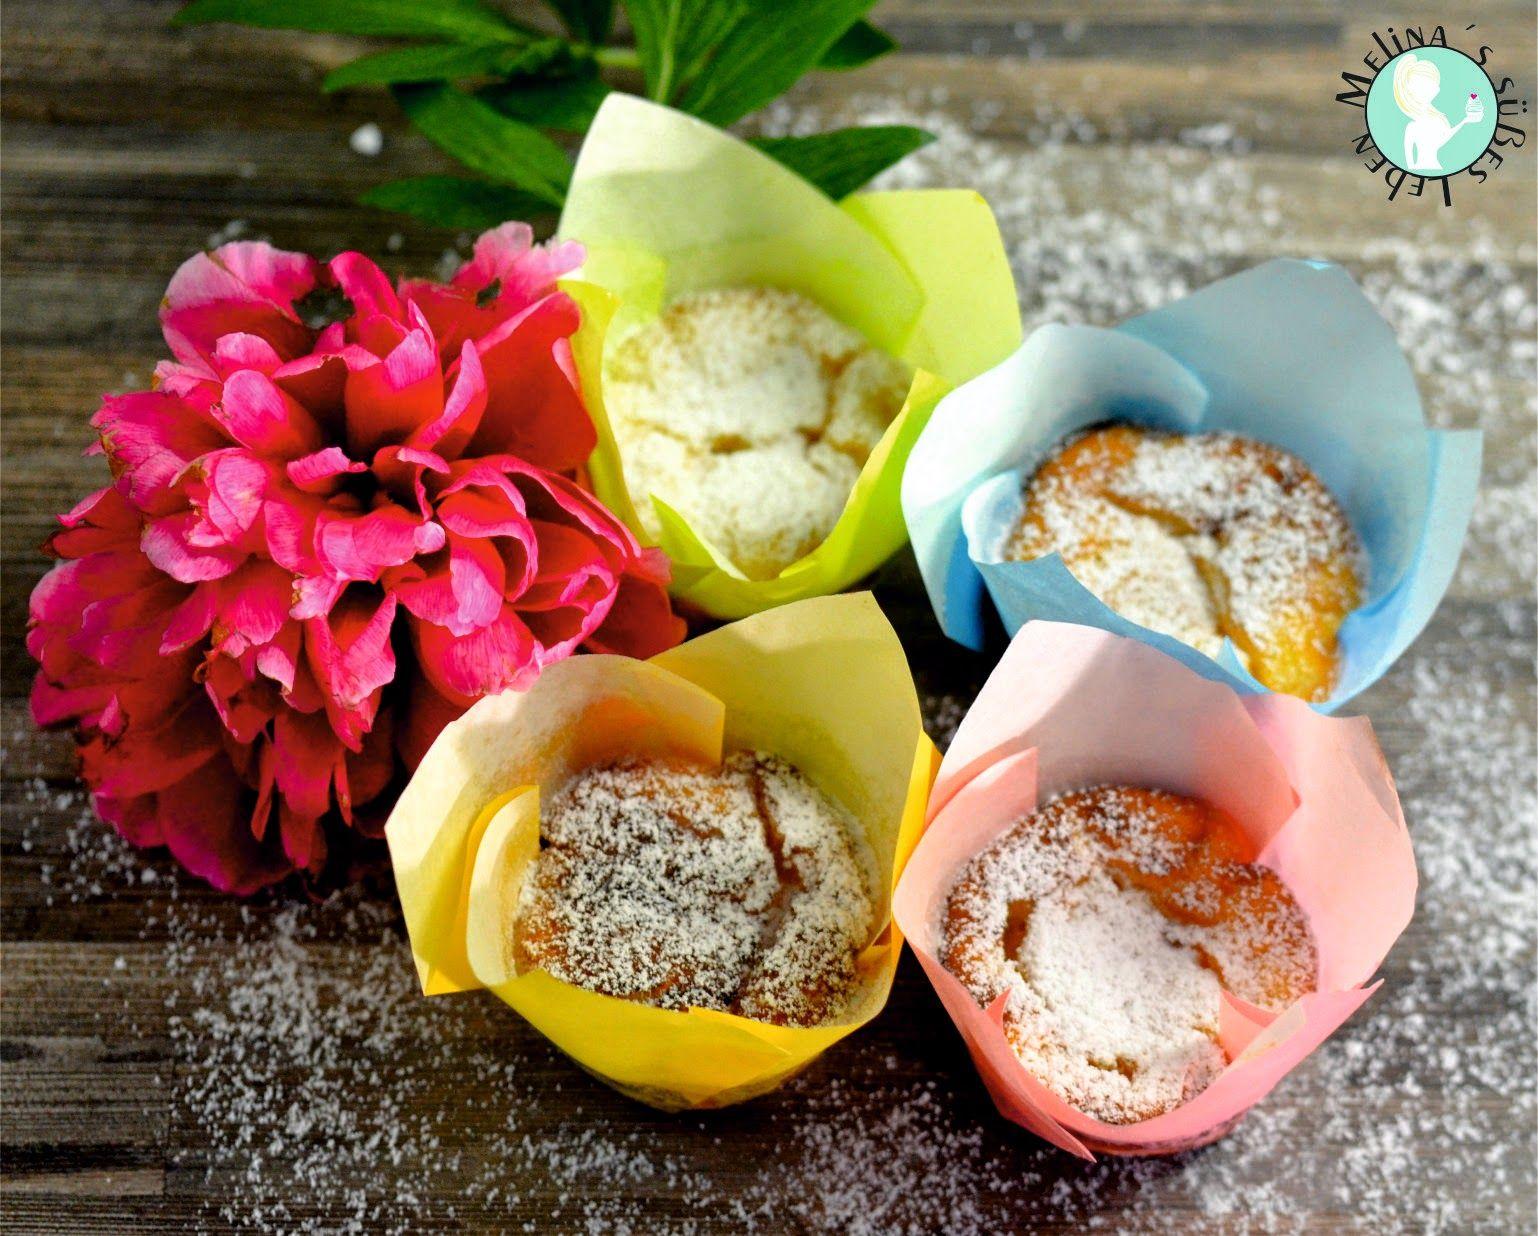 Melina's süßes Leben: Käsekuchen-Muffins (ohne Mehl)